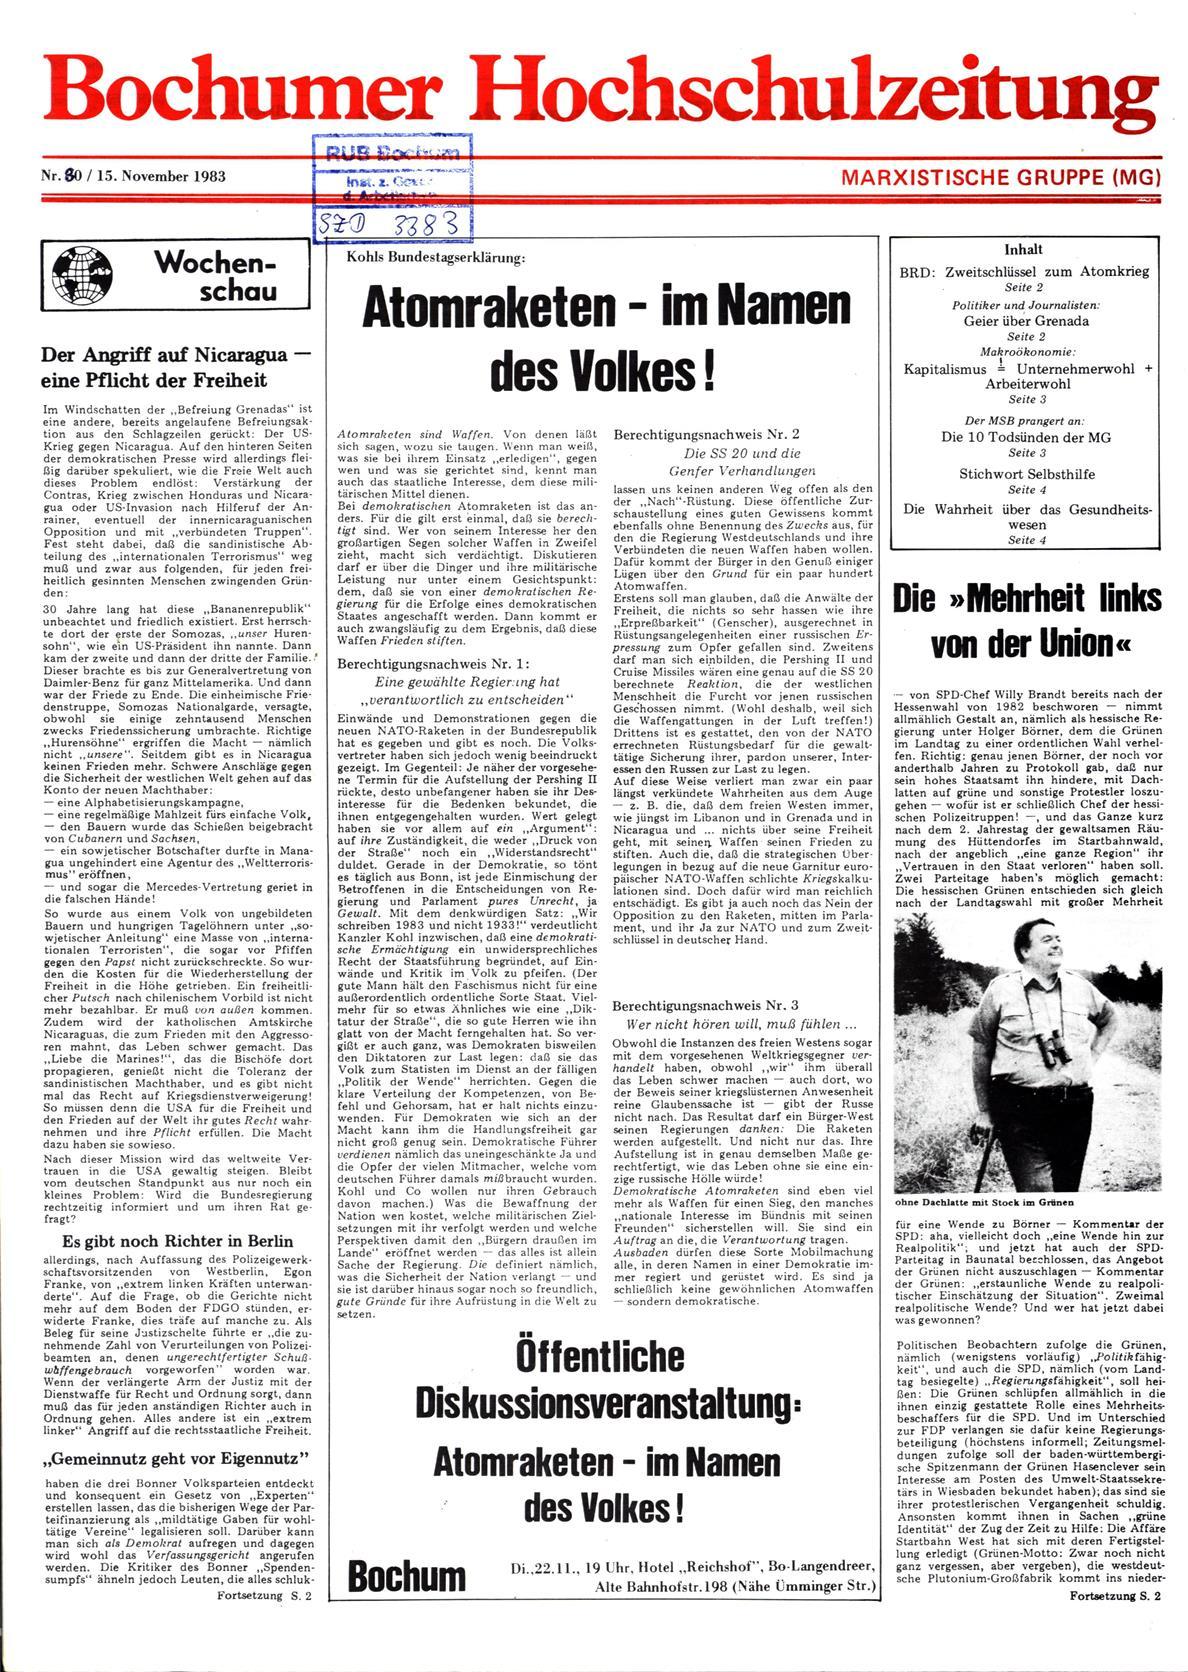 Bochum_BHZ_19831115_080_001